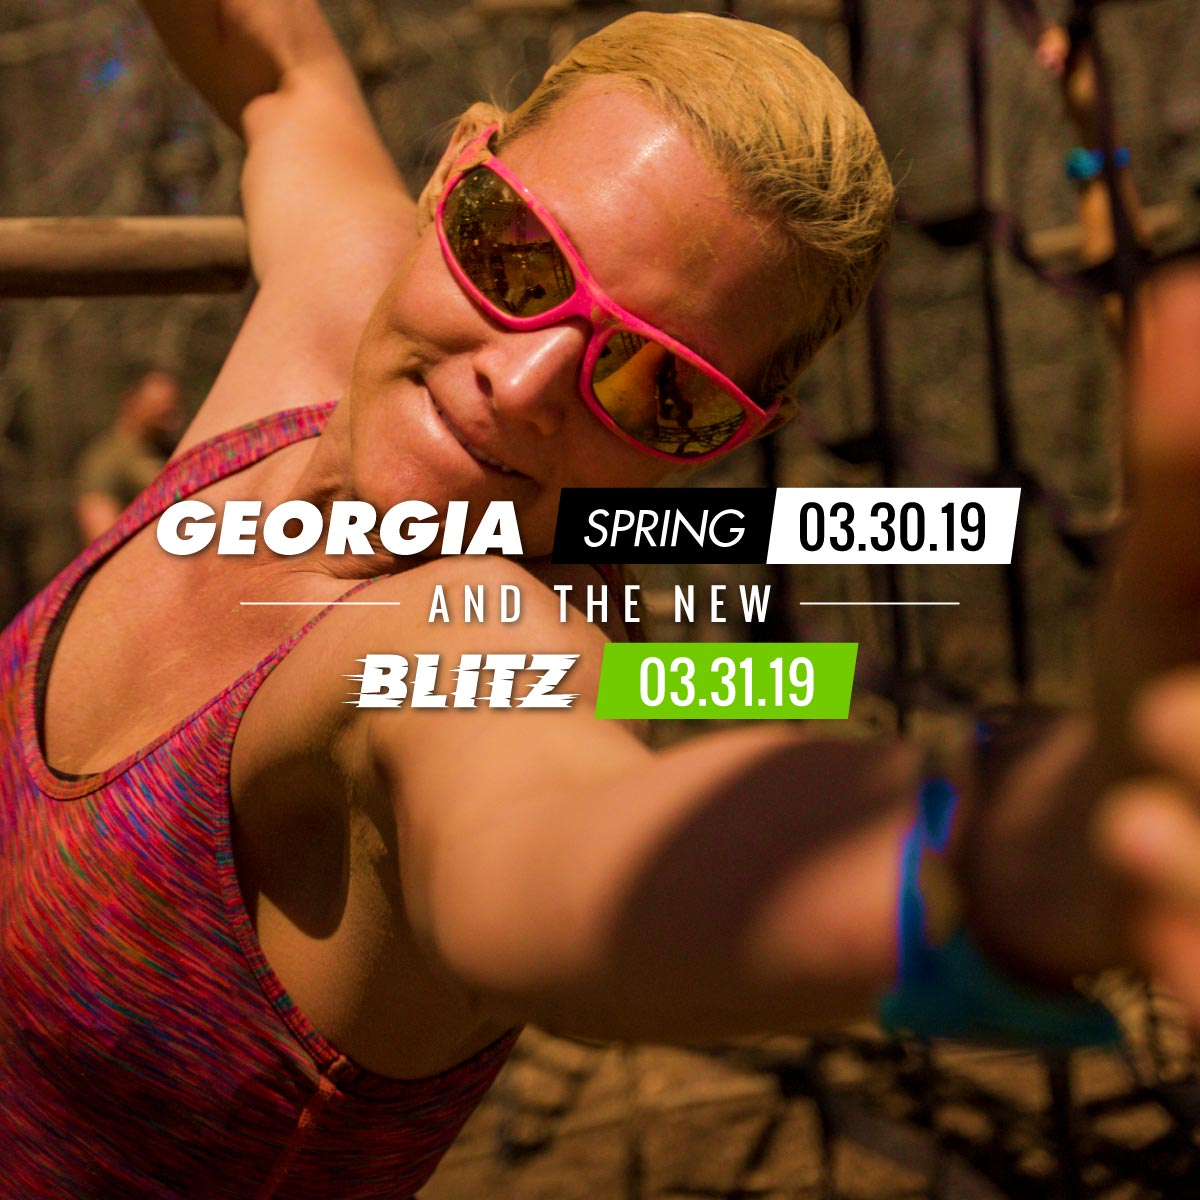 Georgia Spring 2019